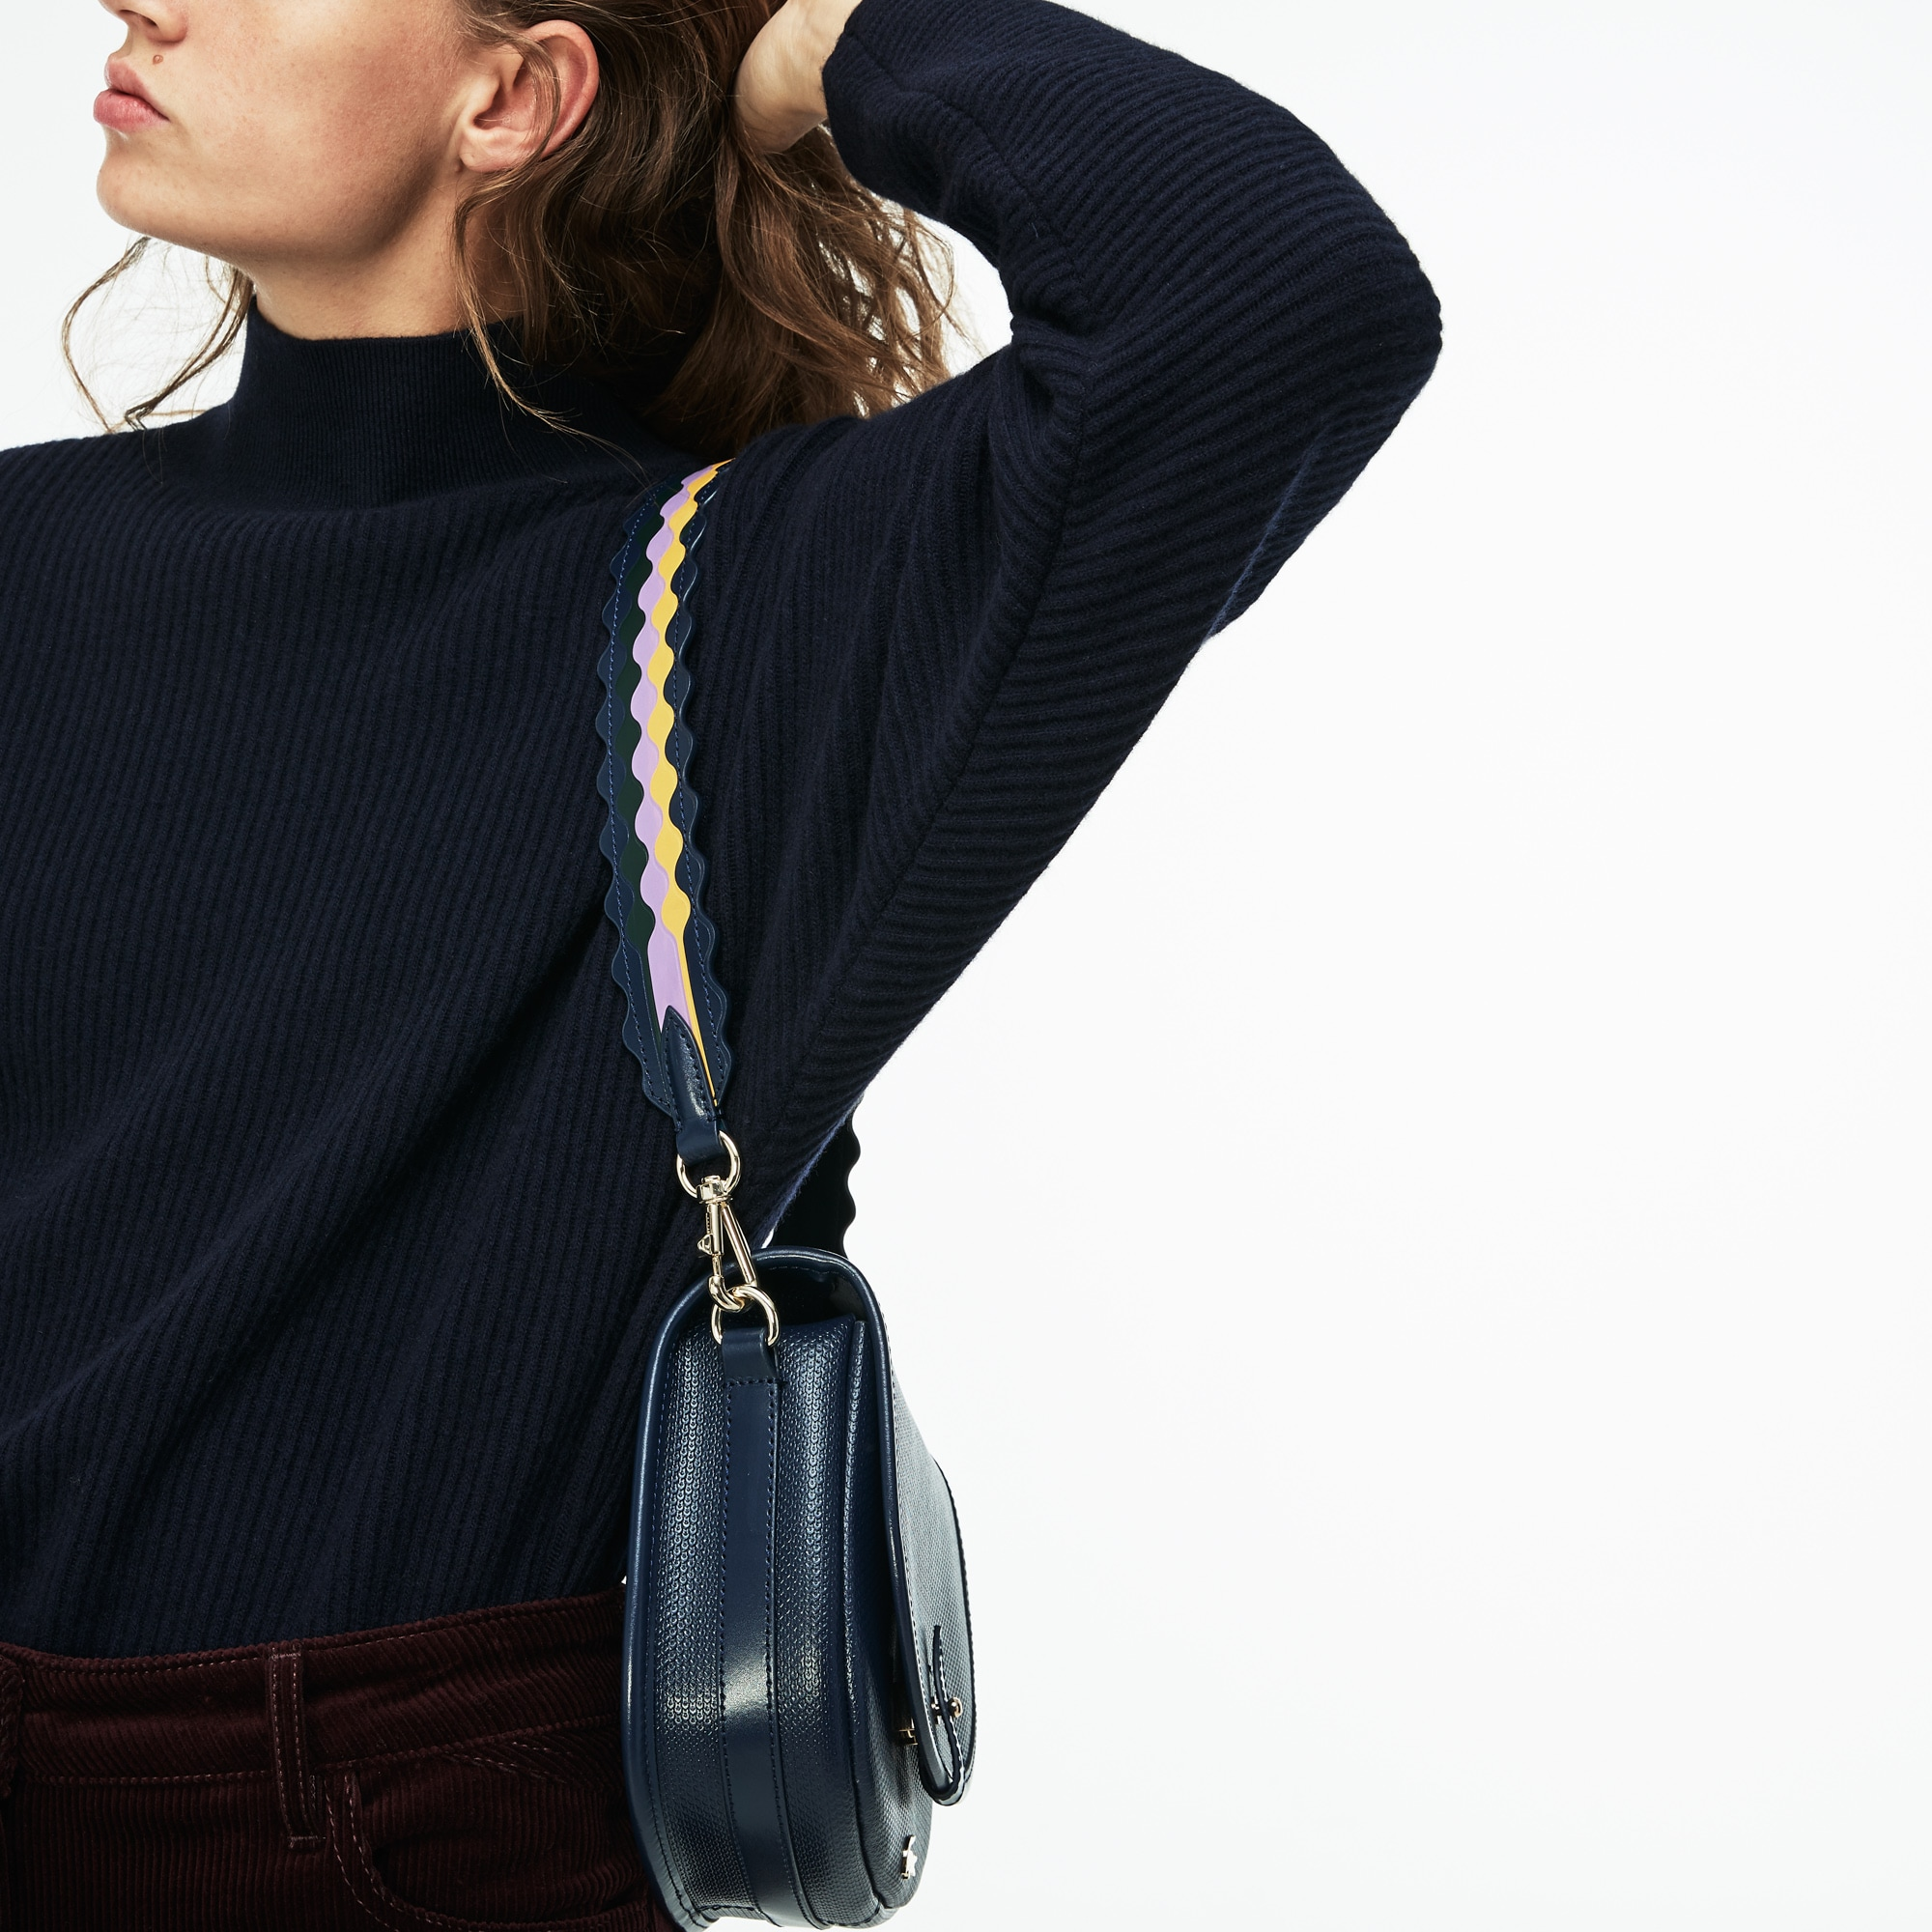 Women's Fancy Straps Colored Waves Leather Shoulder Strap